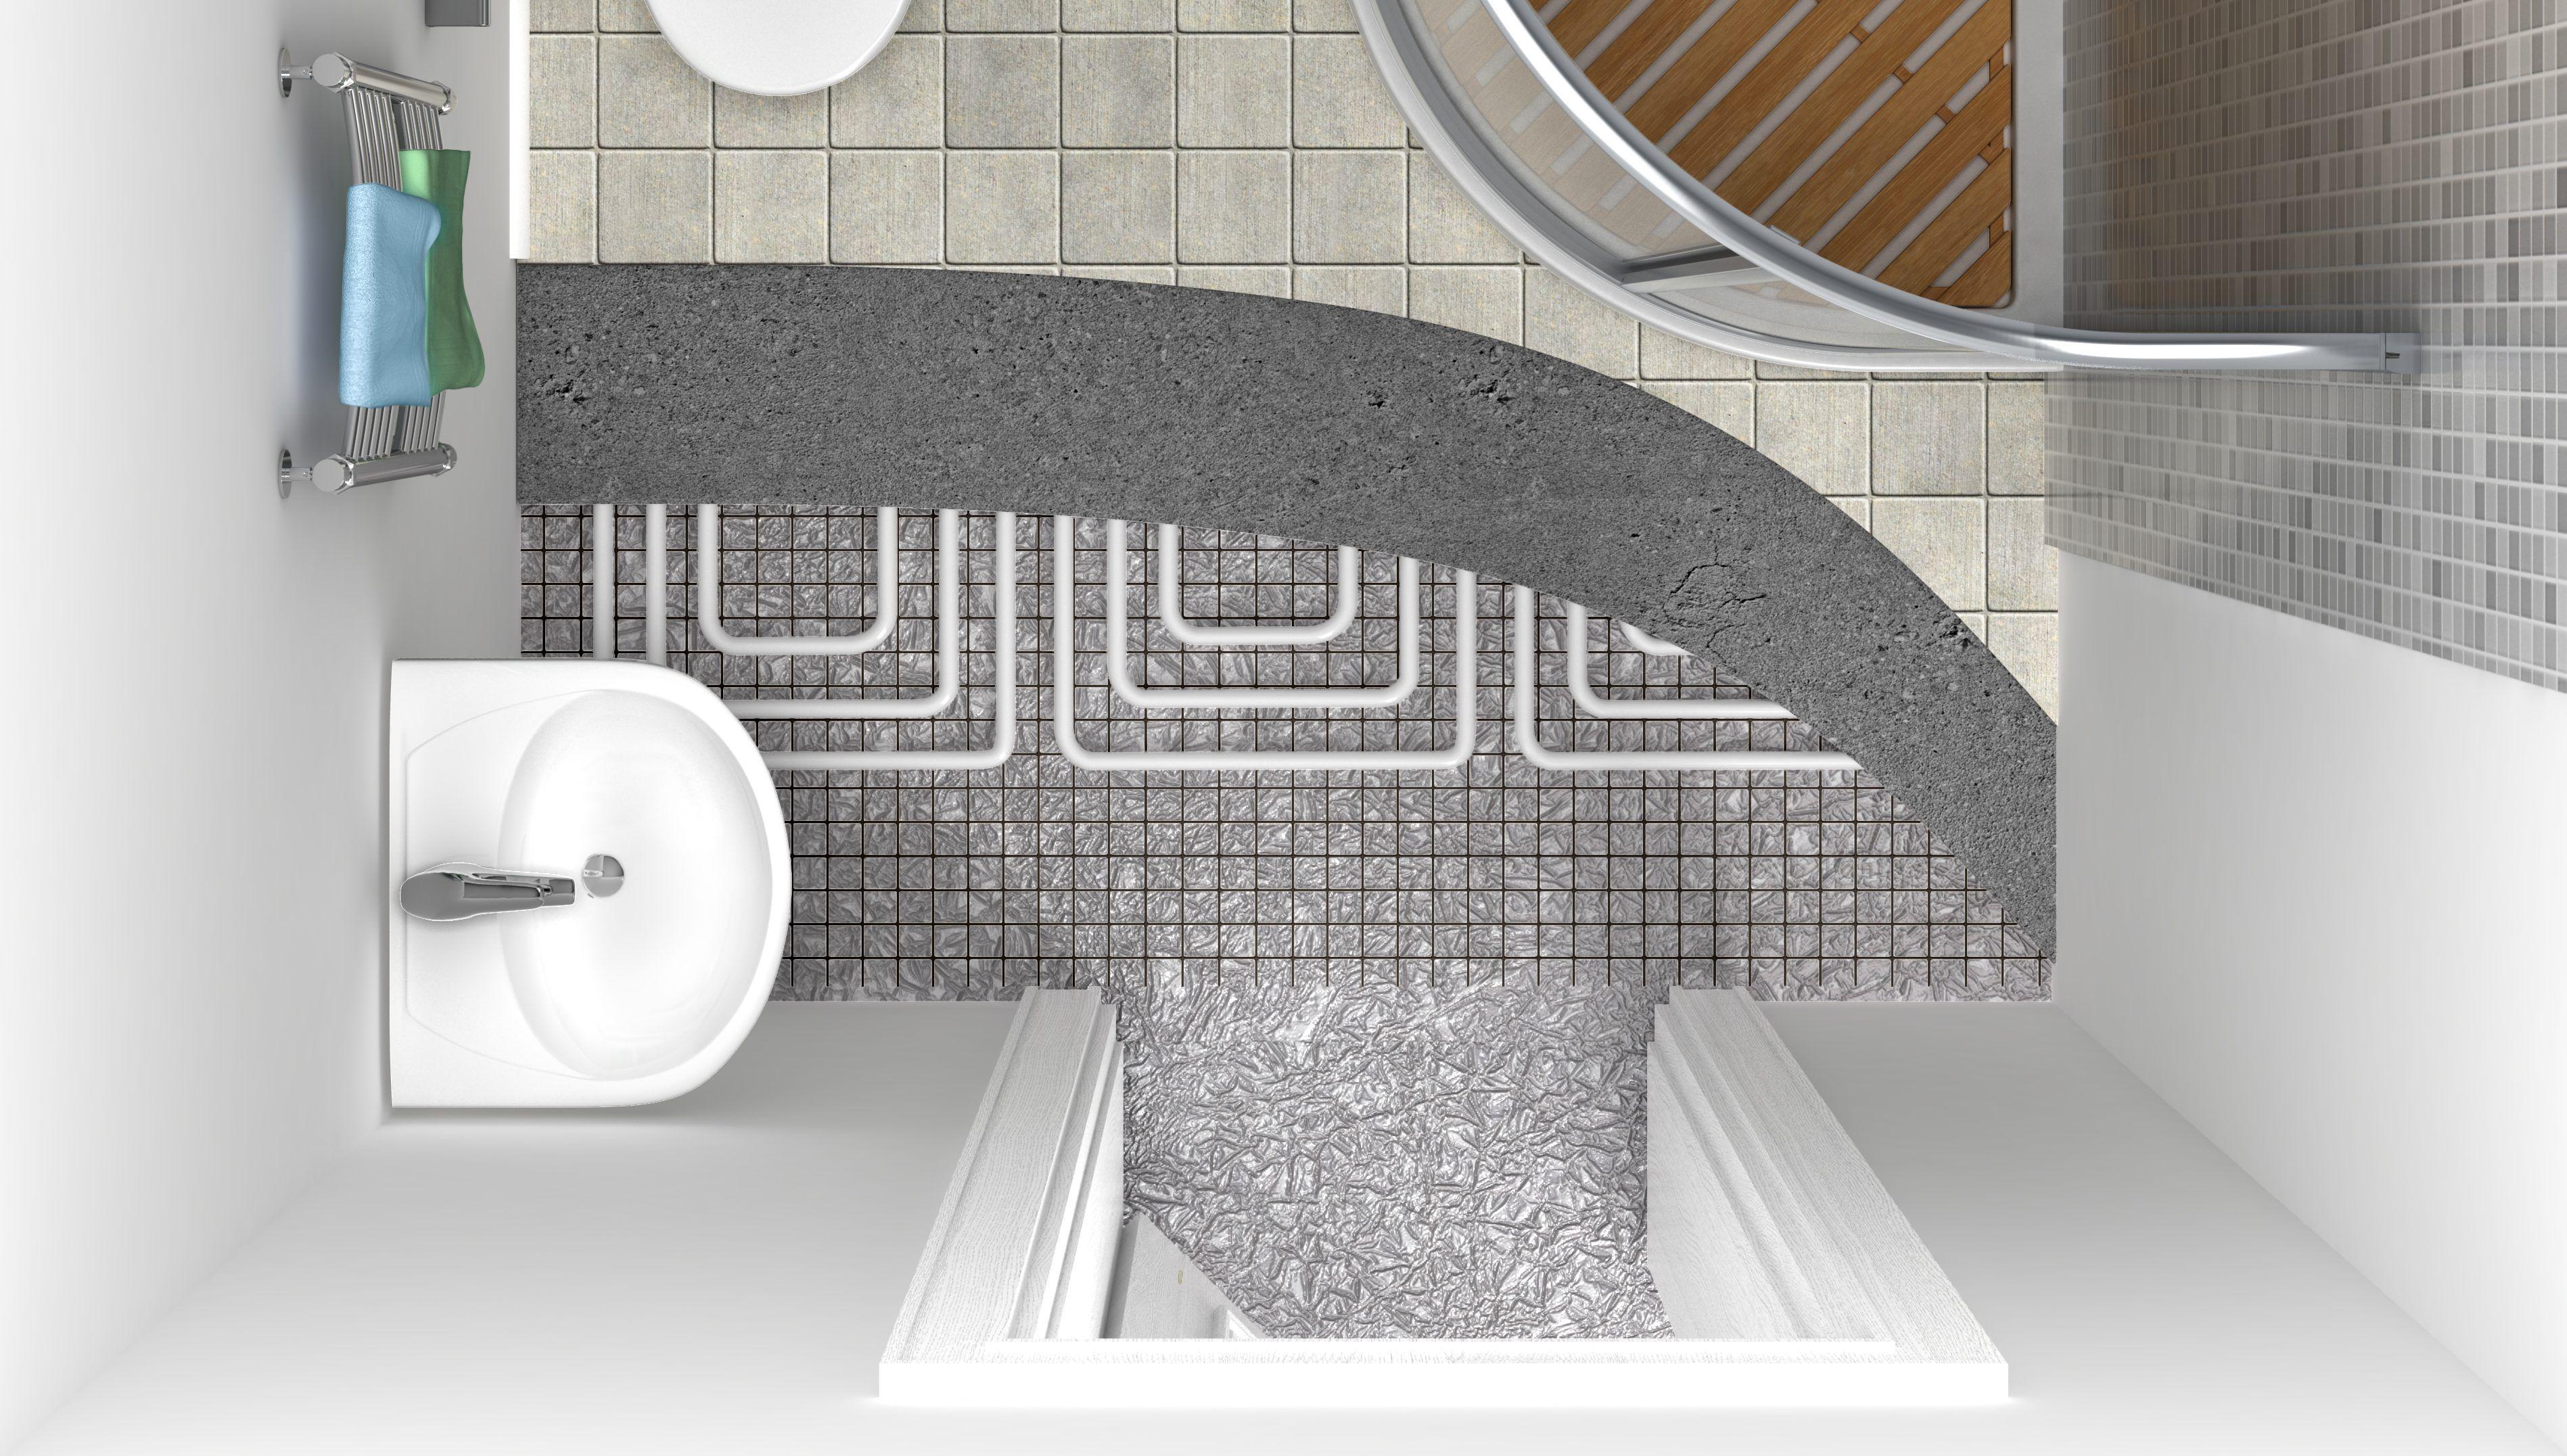 Badkamer verwarmen | Wat is de beste badkamer verwarming?